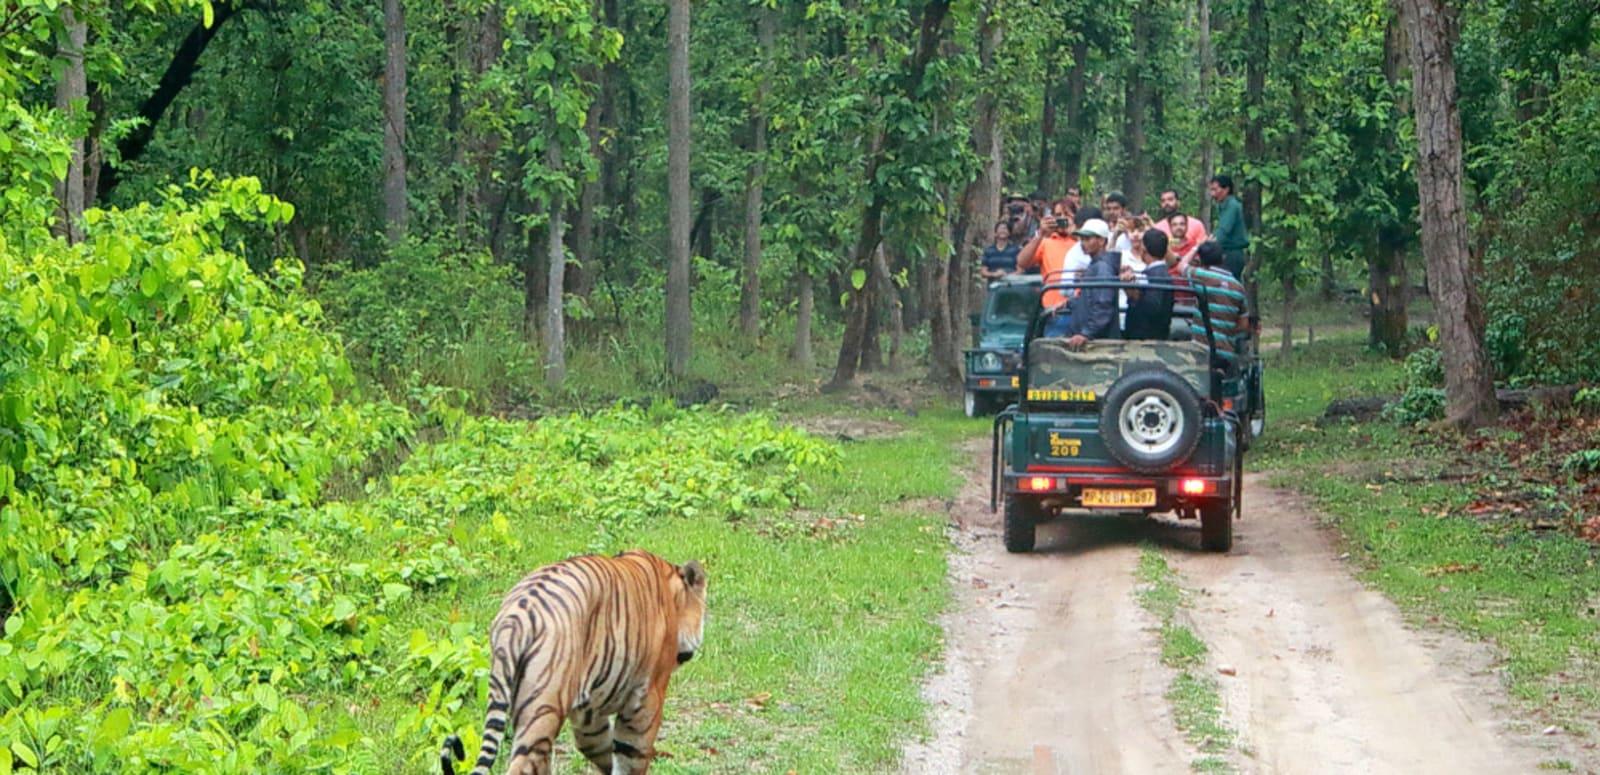 Indian Safaris explained